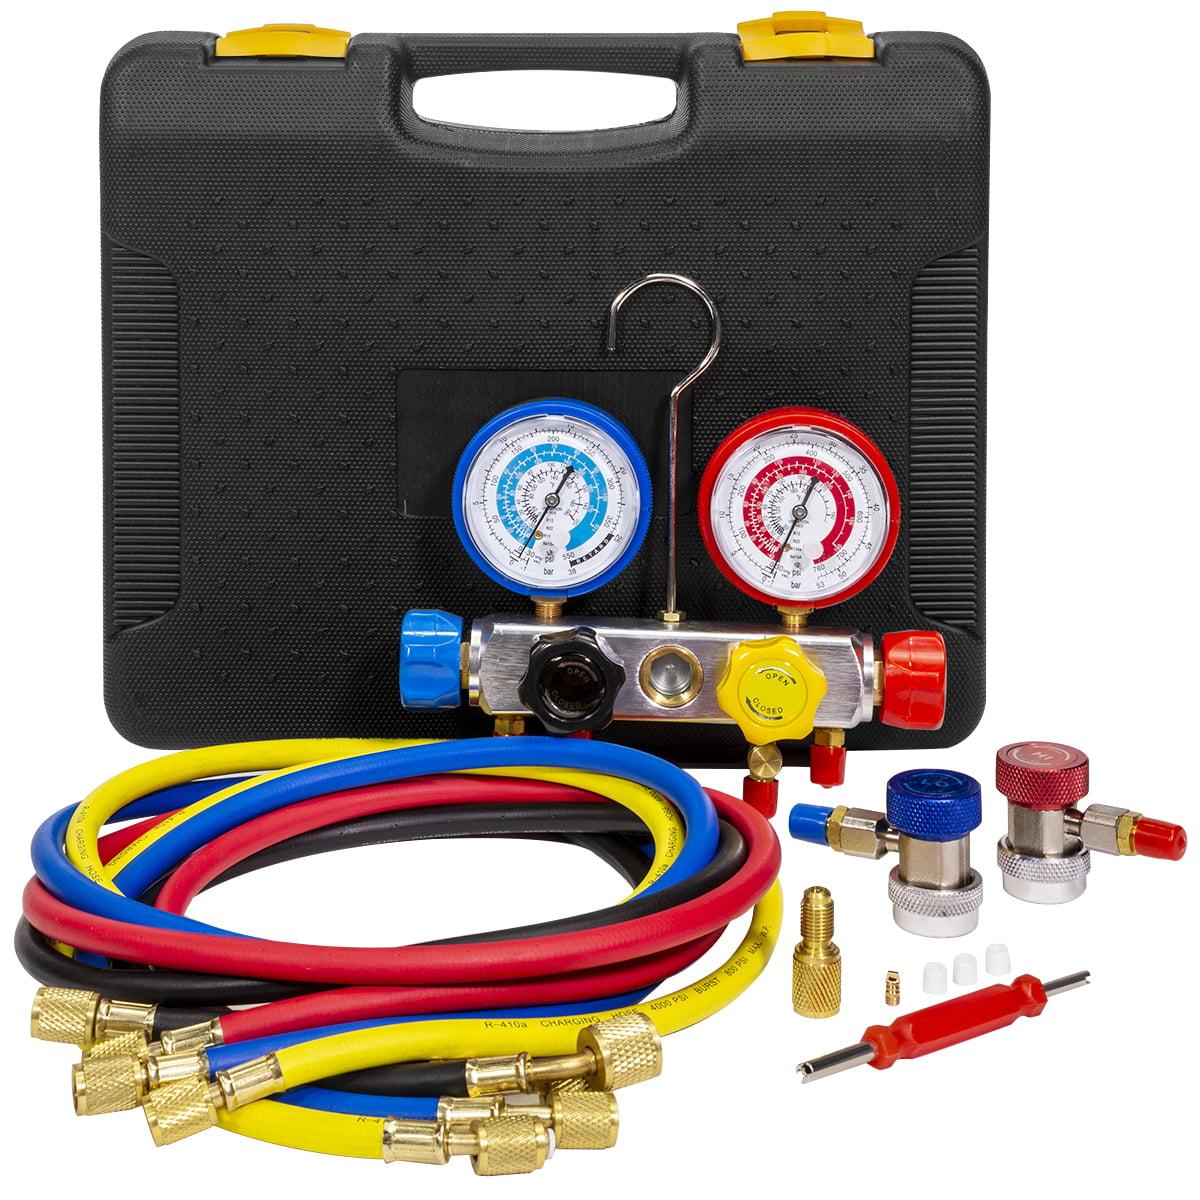 Stark Manifold Gauge Set R410A R22 R404A HVAC A//C Refrigeration Charging Service Diagnostic Refrigerants 5ft Hose